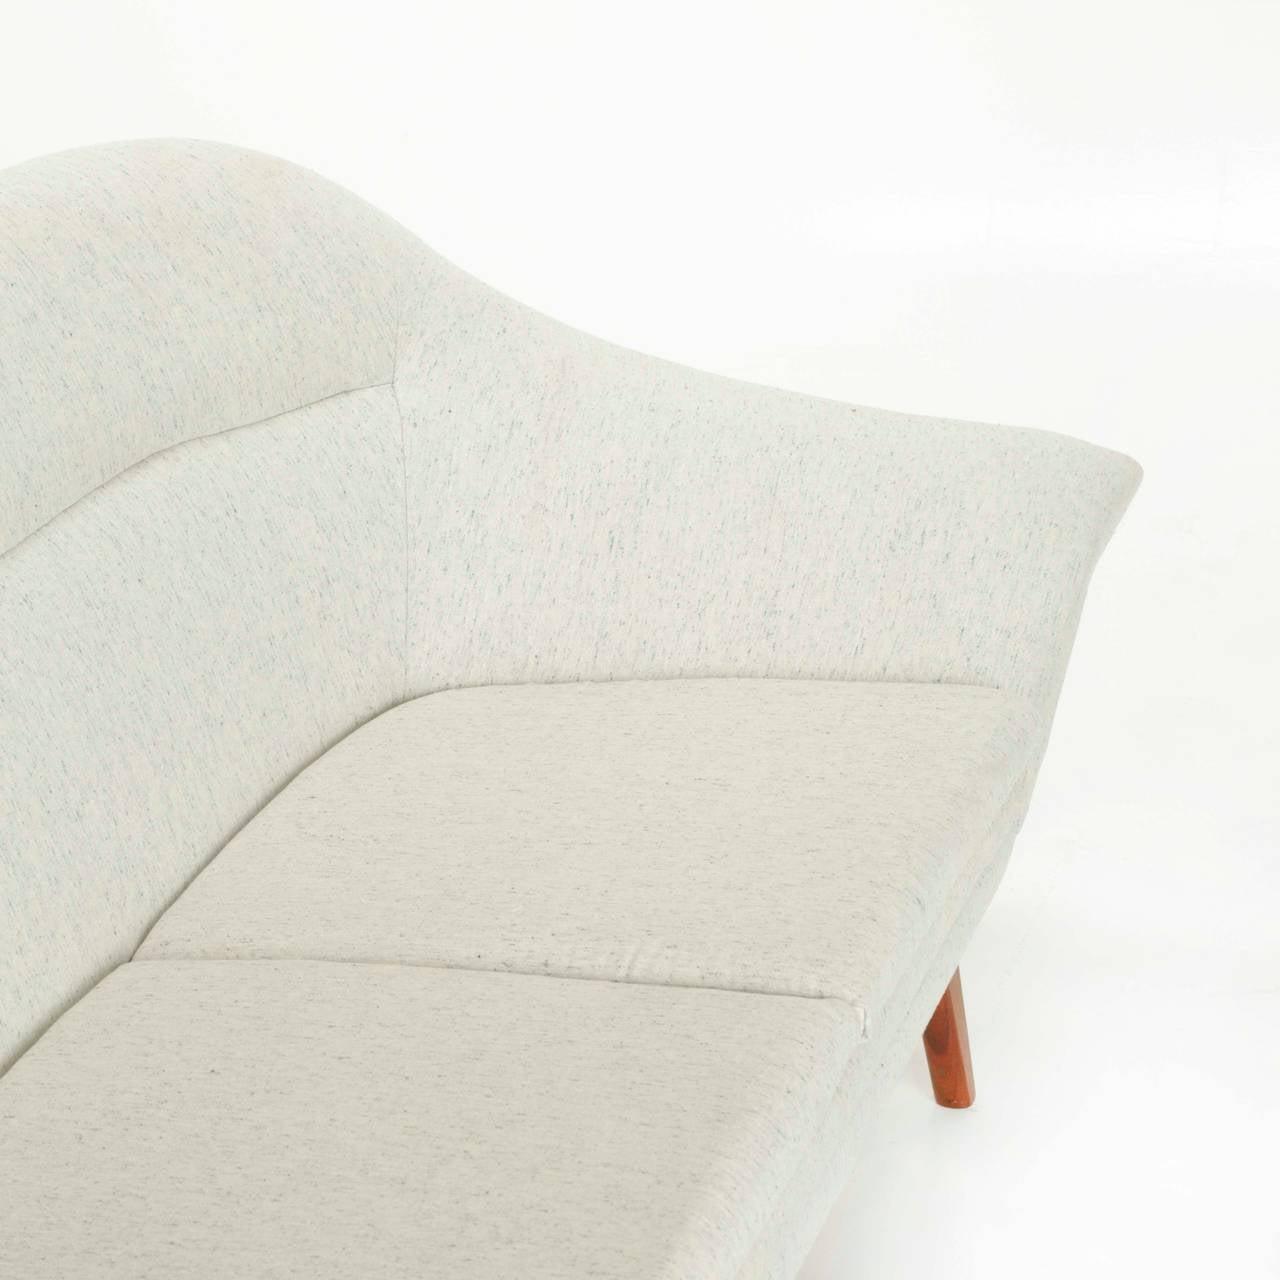 Rare Norwegian Teak and Fabric Sofa Rastad & Relling as Attribution 6